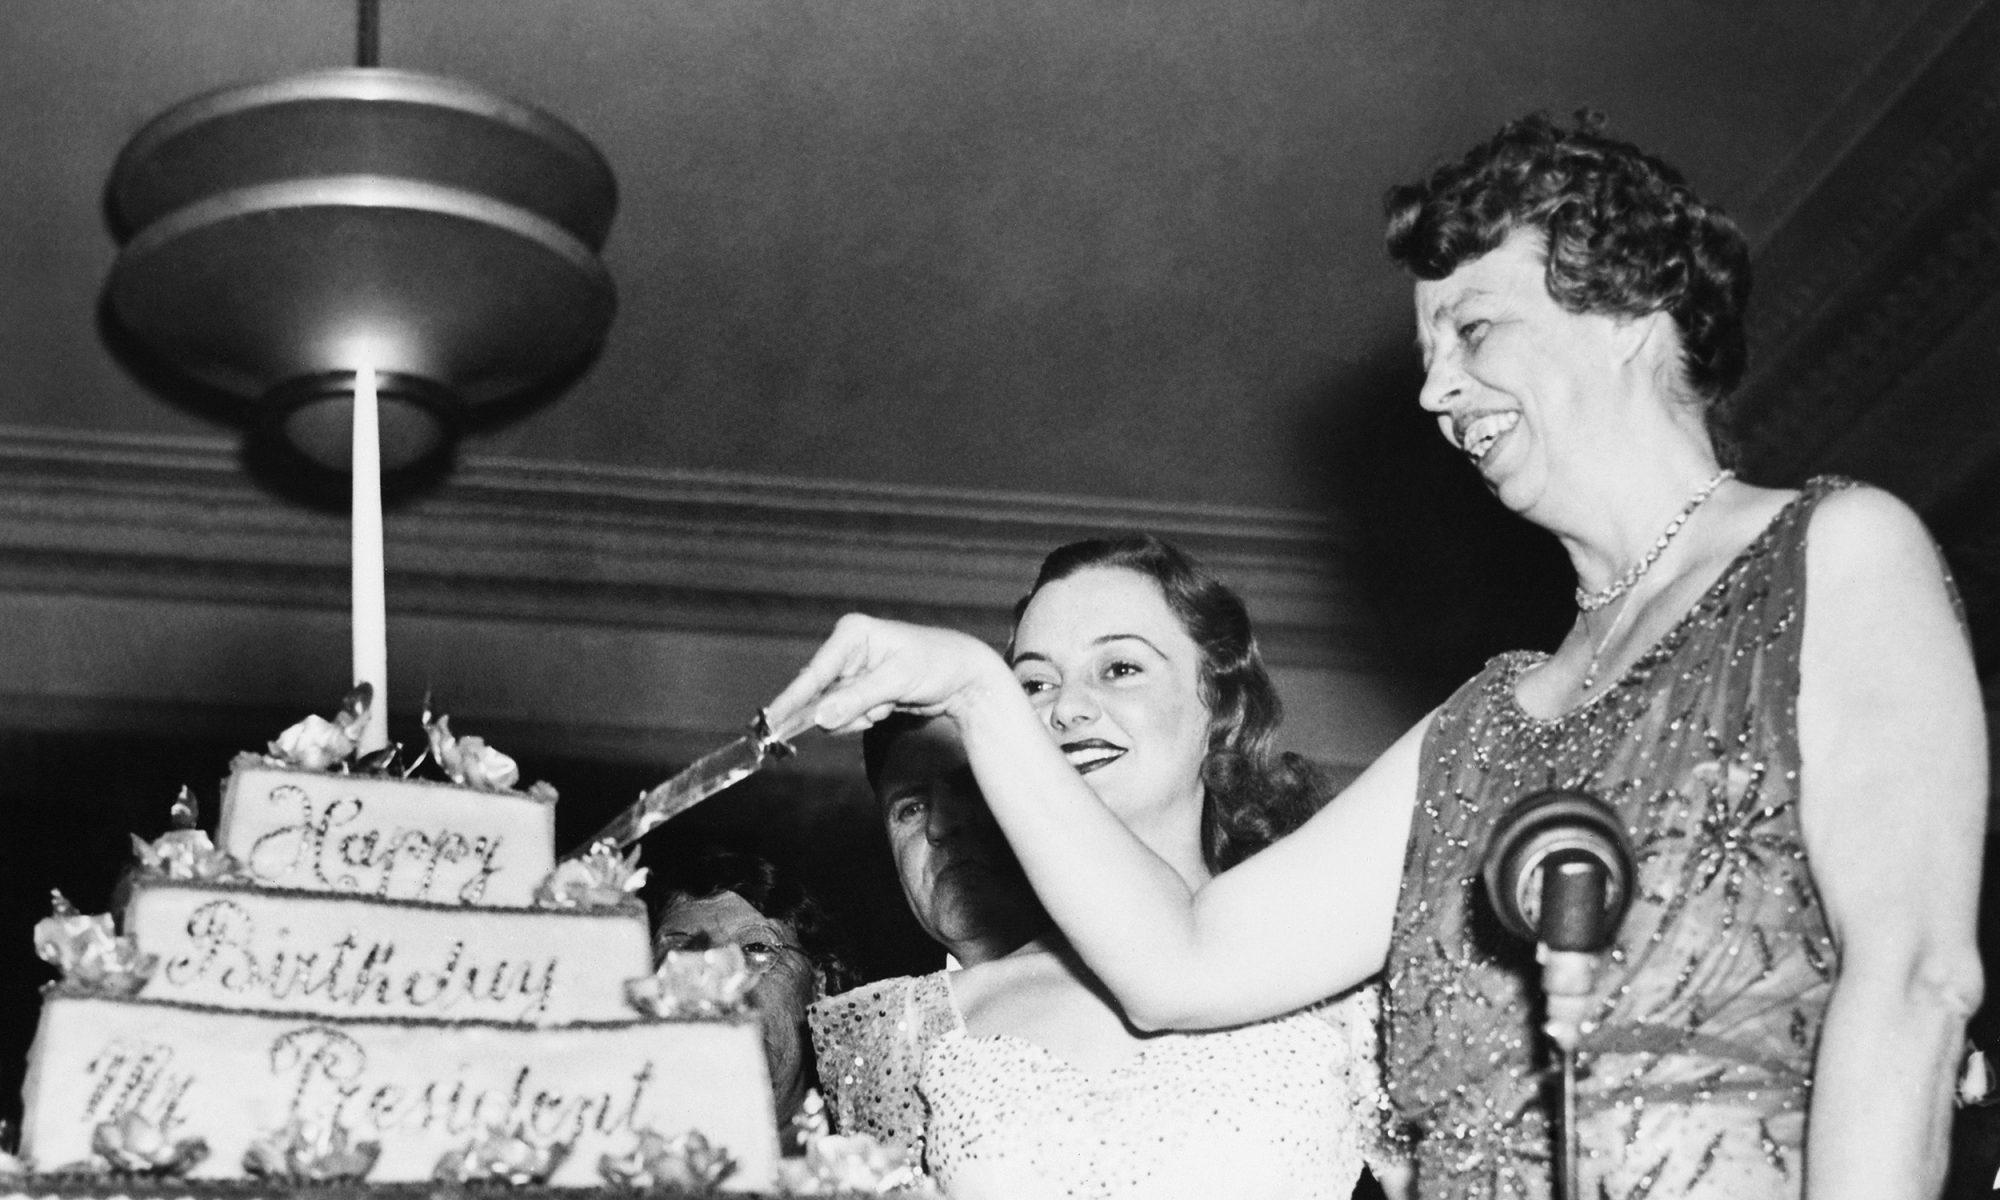 Eleanor Roosevelt cuts birthday cake